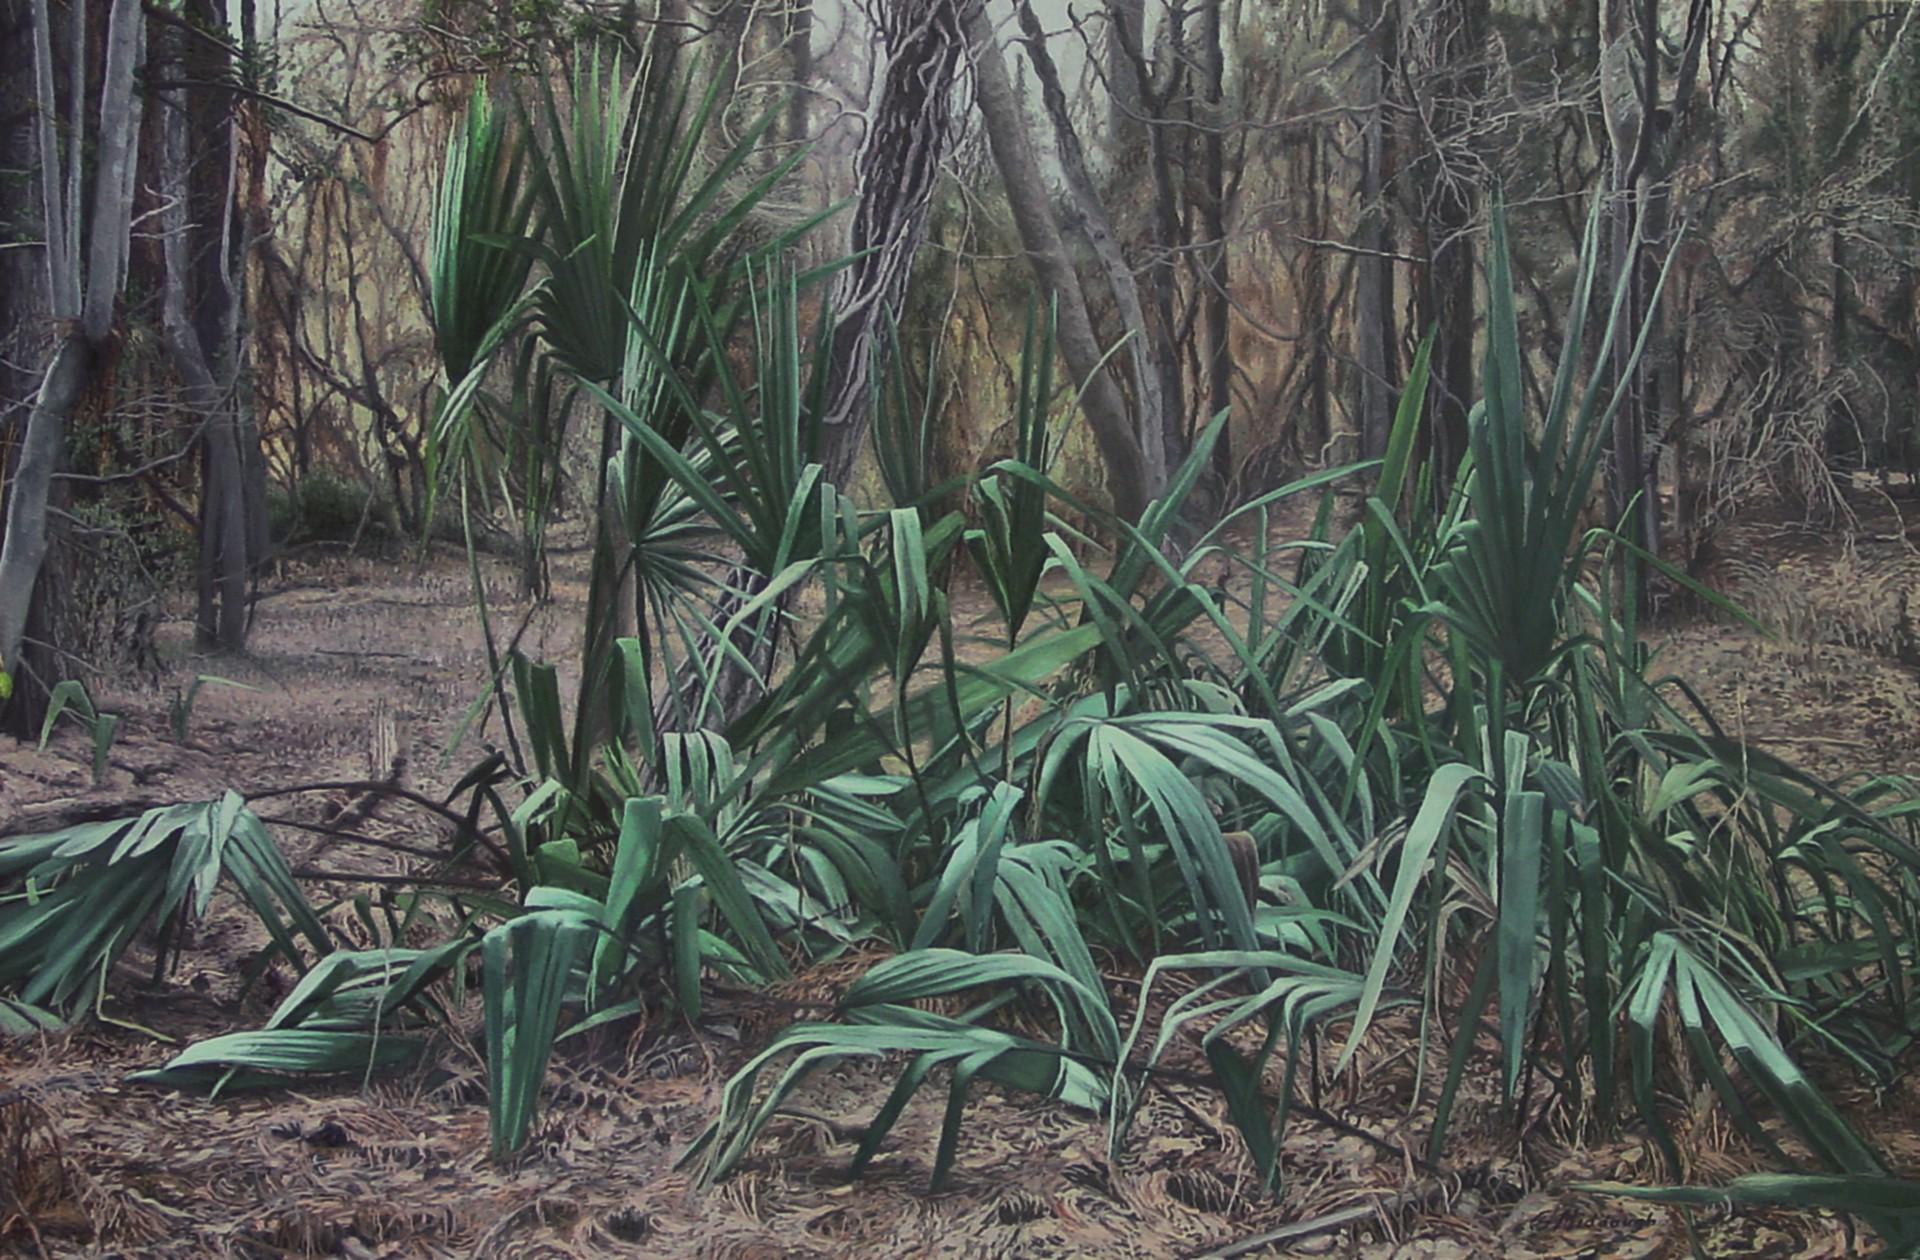 Gathering of Palmettos by Garrett Middaugh